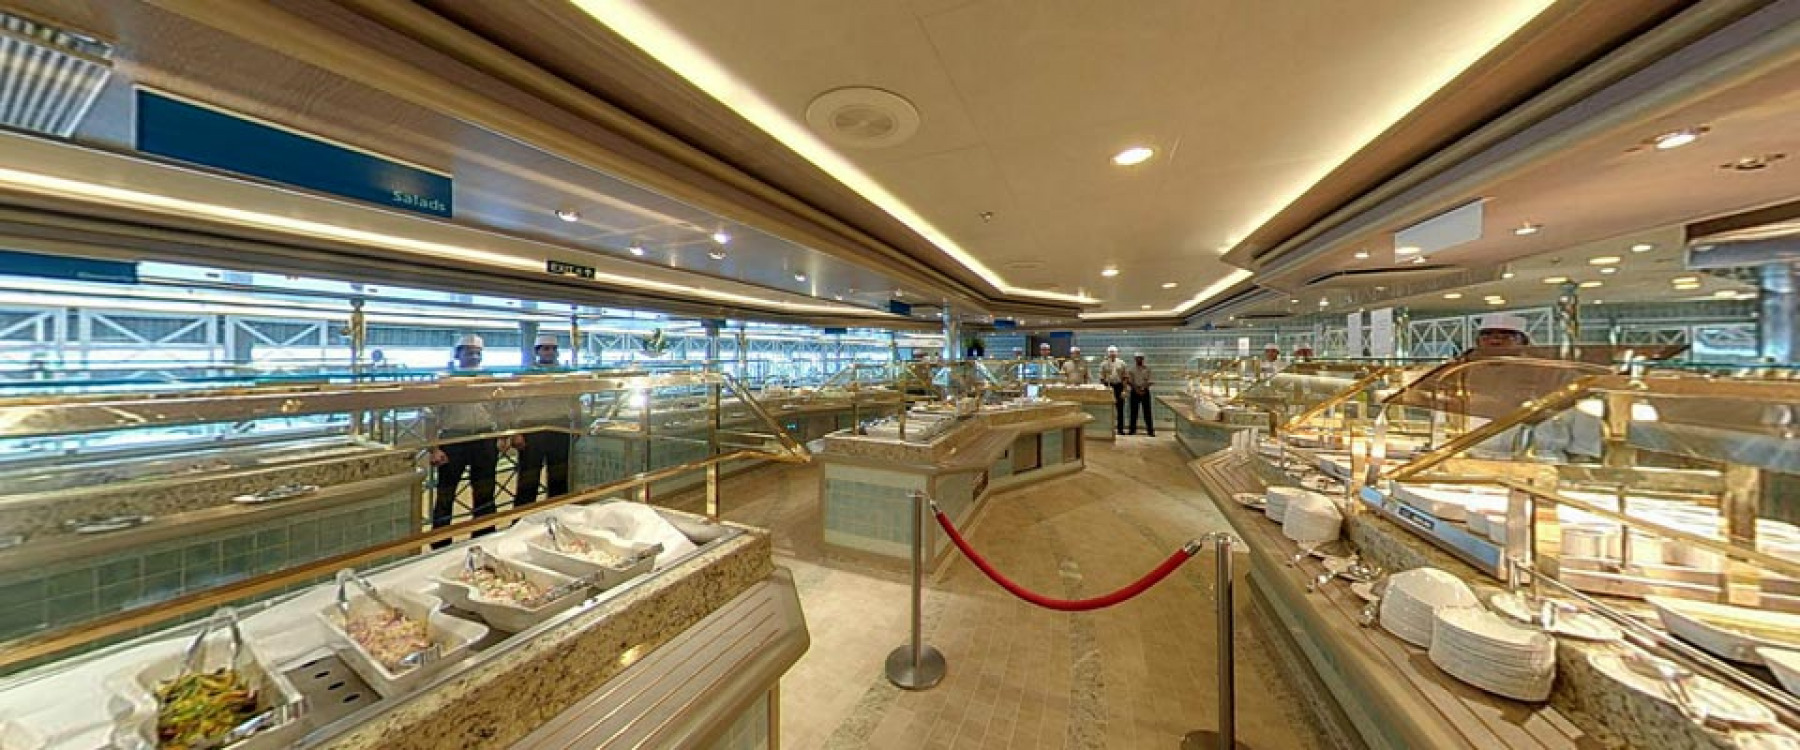 P&O Cruises Azura Interior Venezia 2.jpg